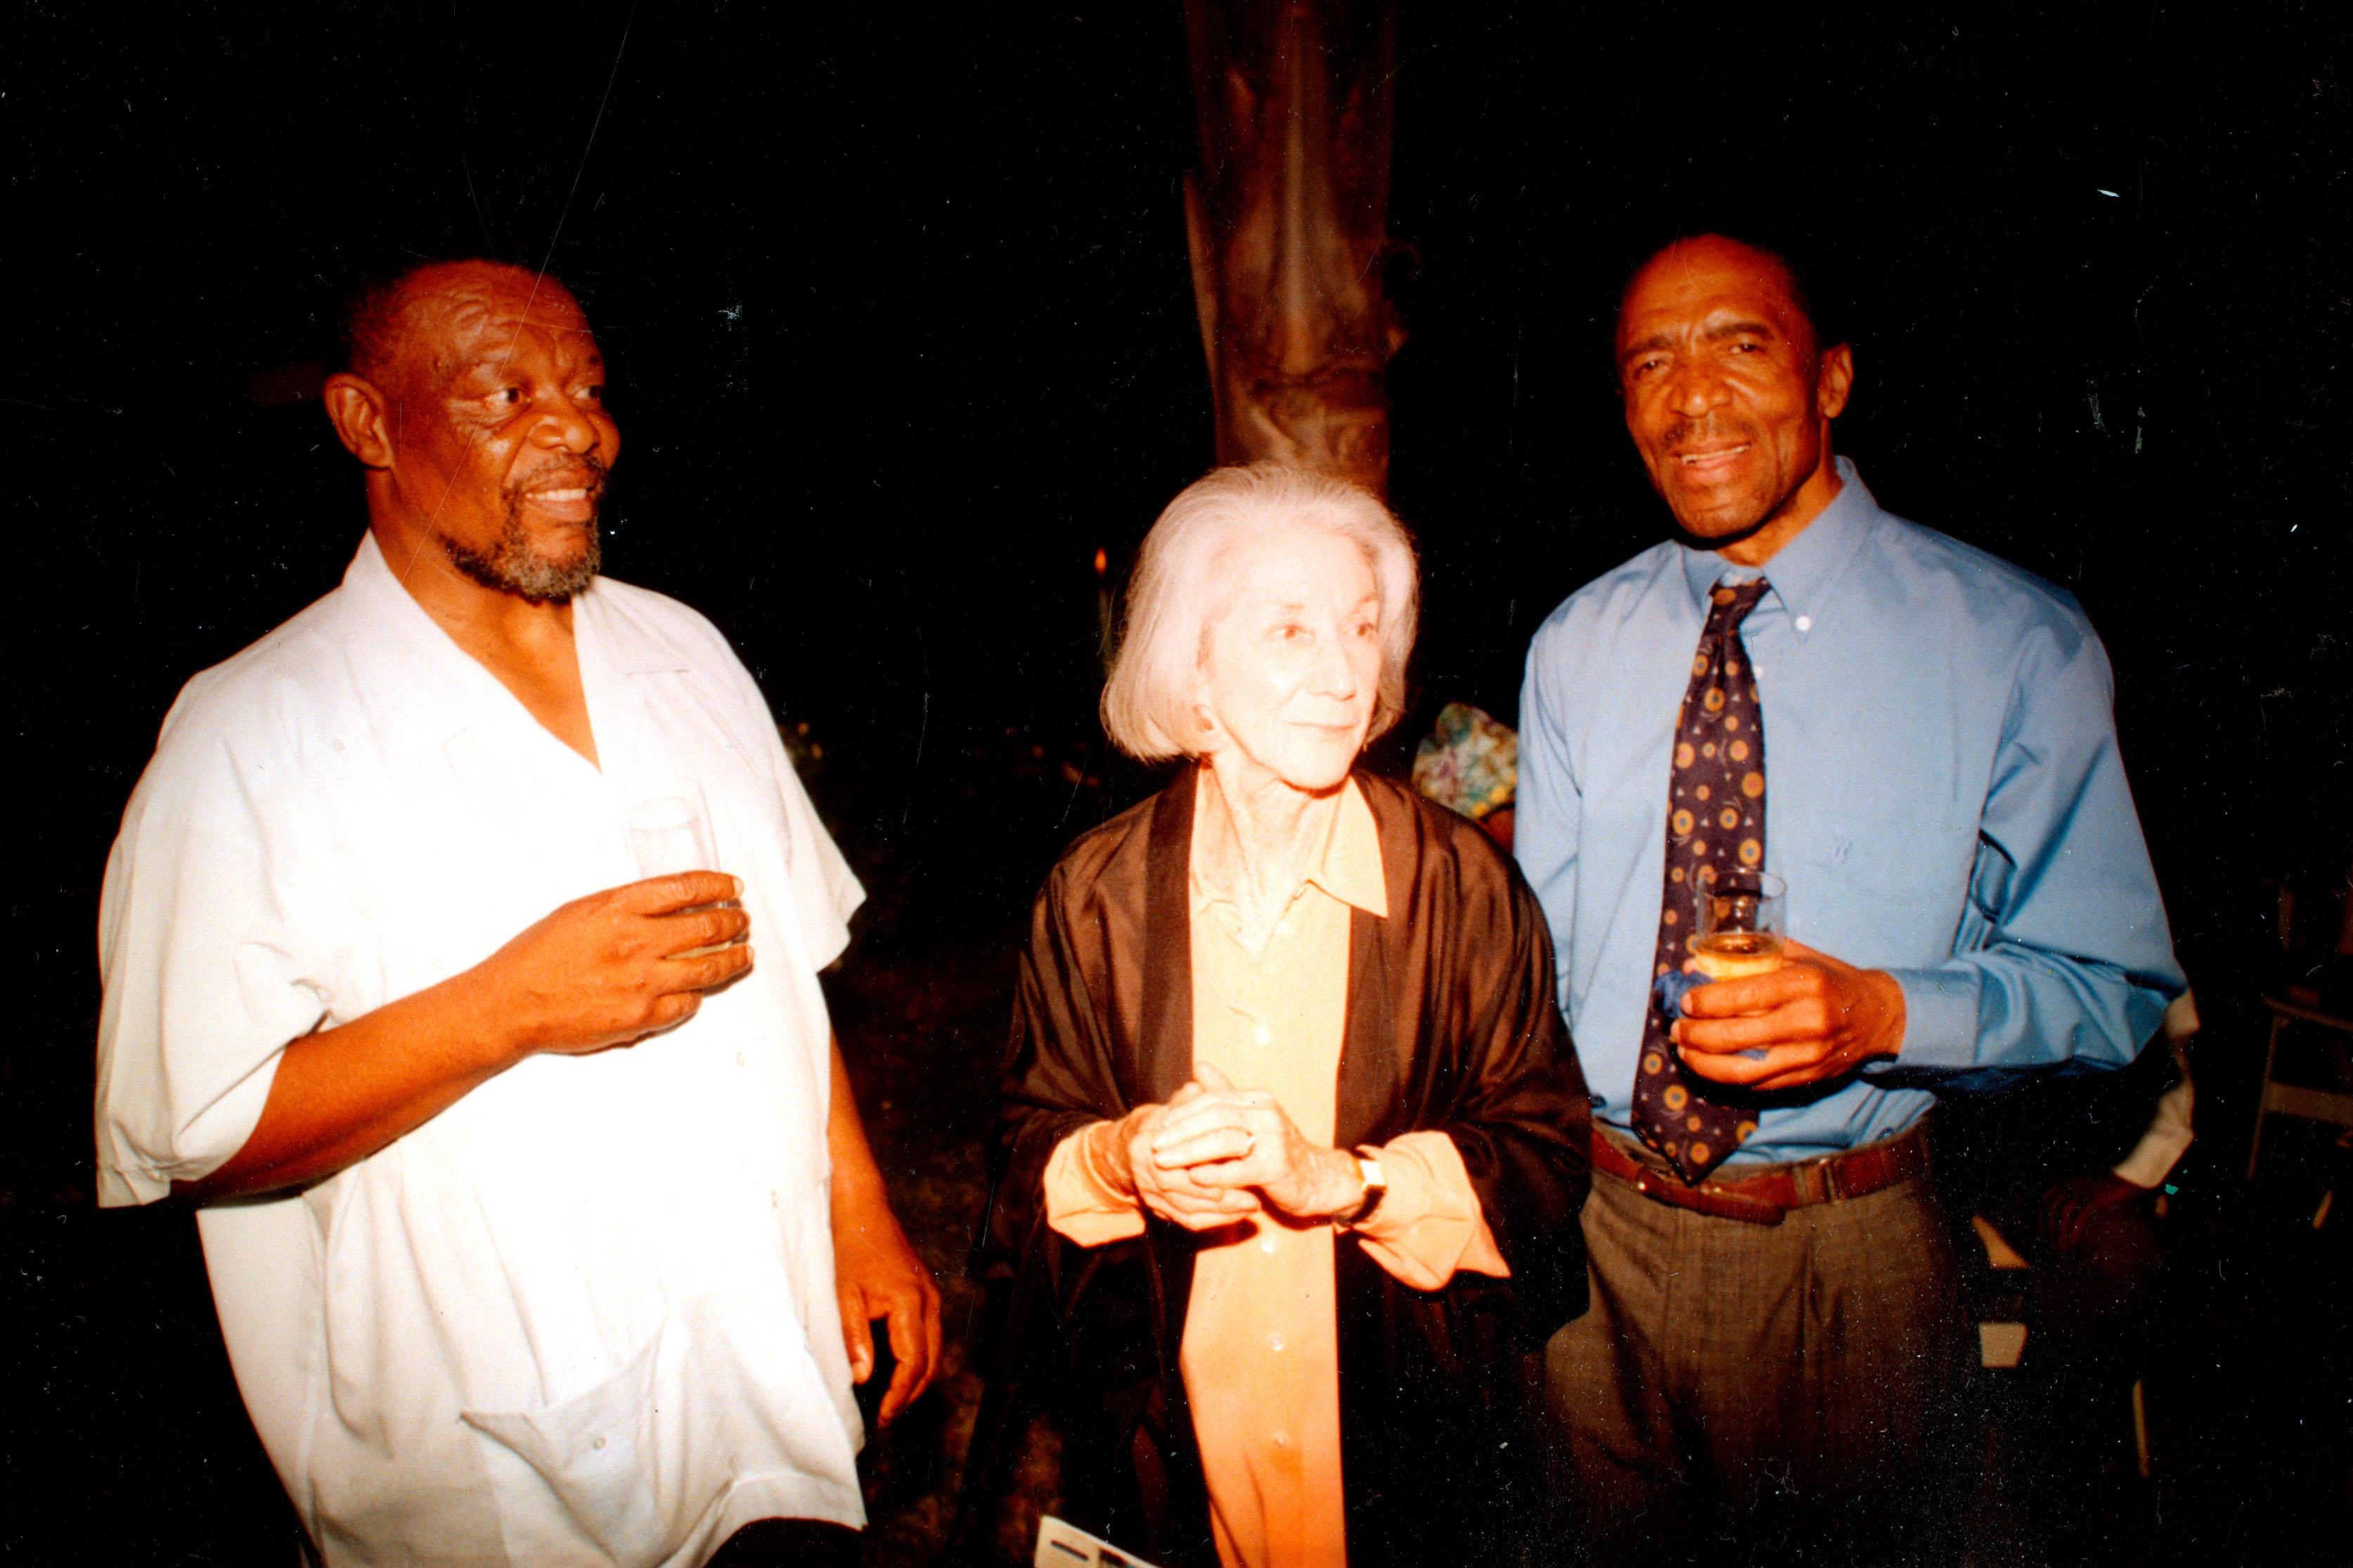 Undated: From left, poet Mongane Wally Serote, novelist Nadine Gordimer and David Koloane. (Photograph: Supplied)